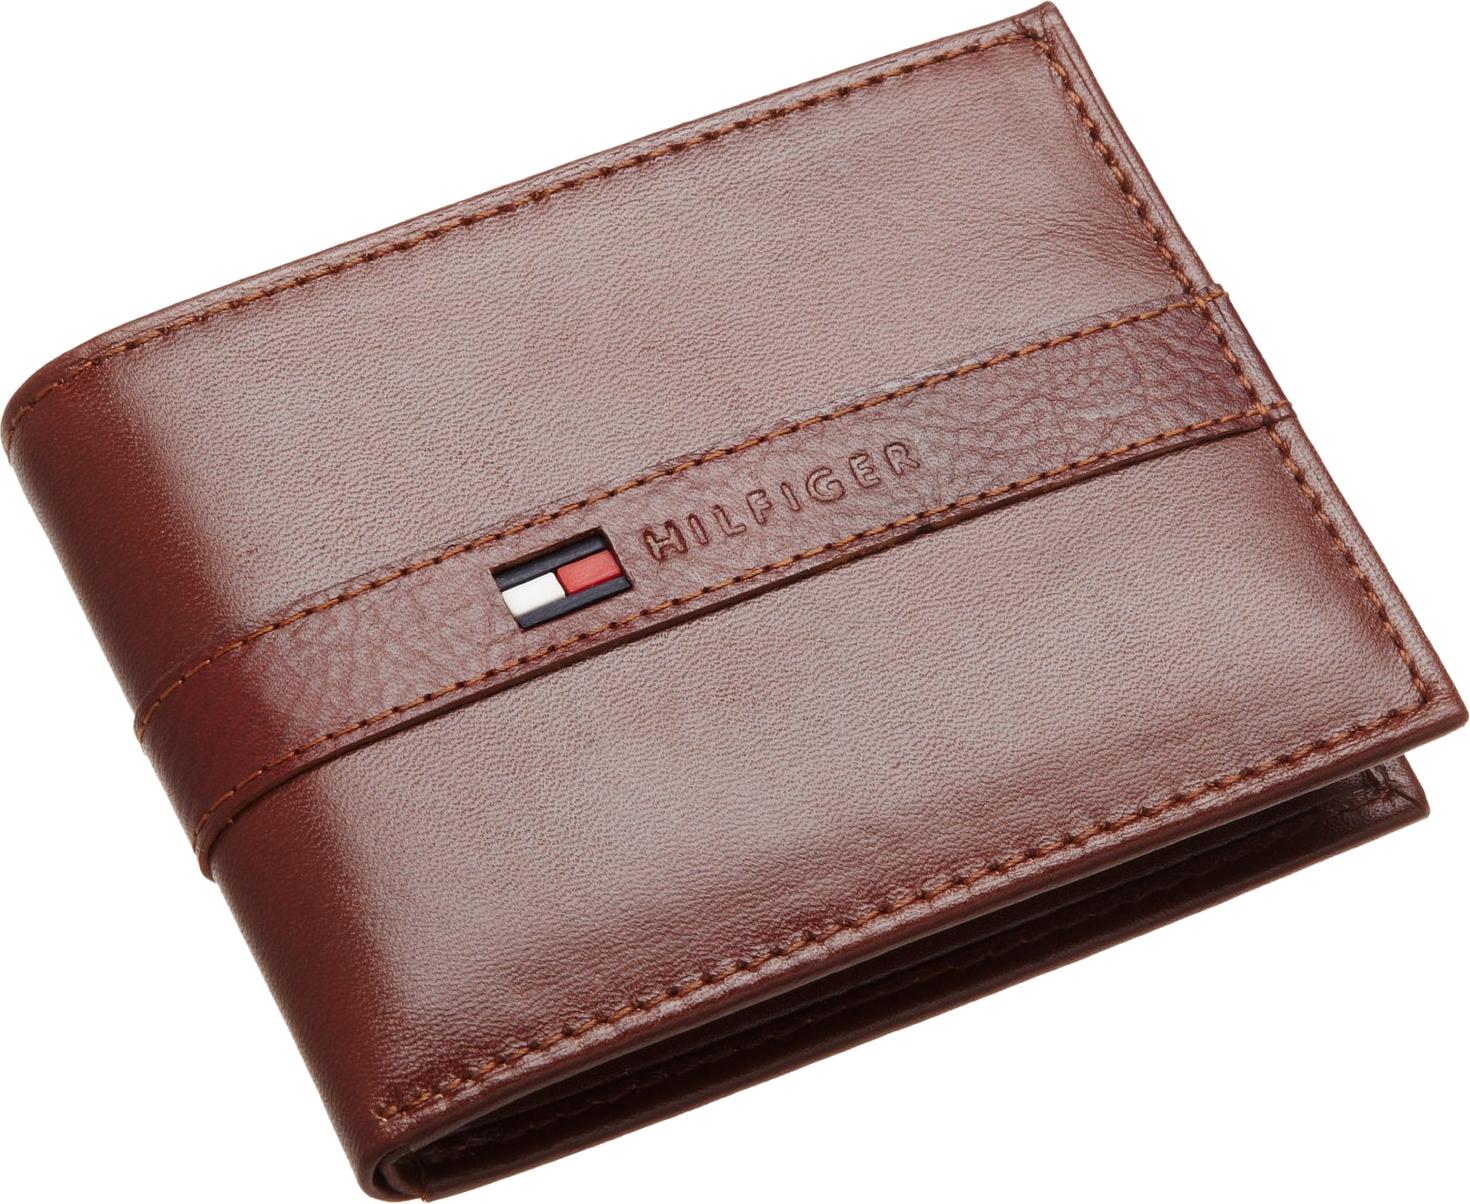 Wallet PNG